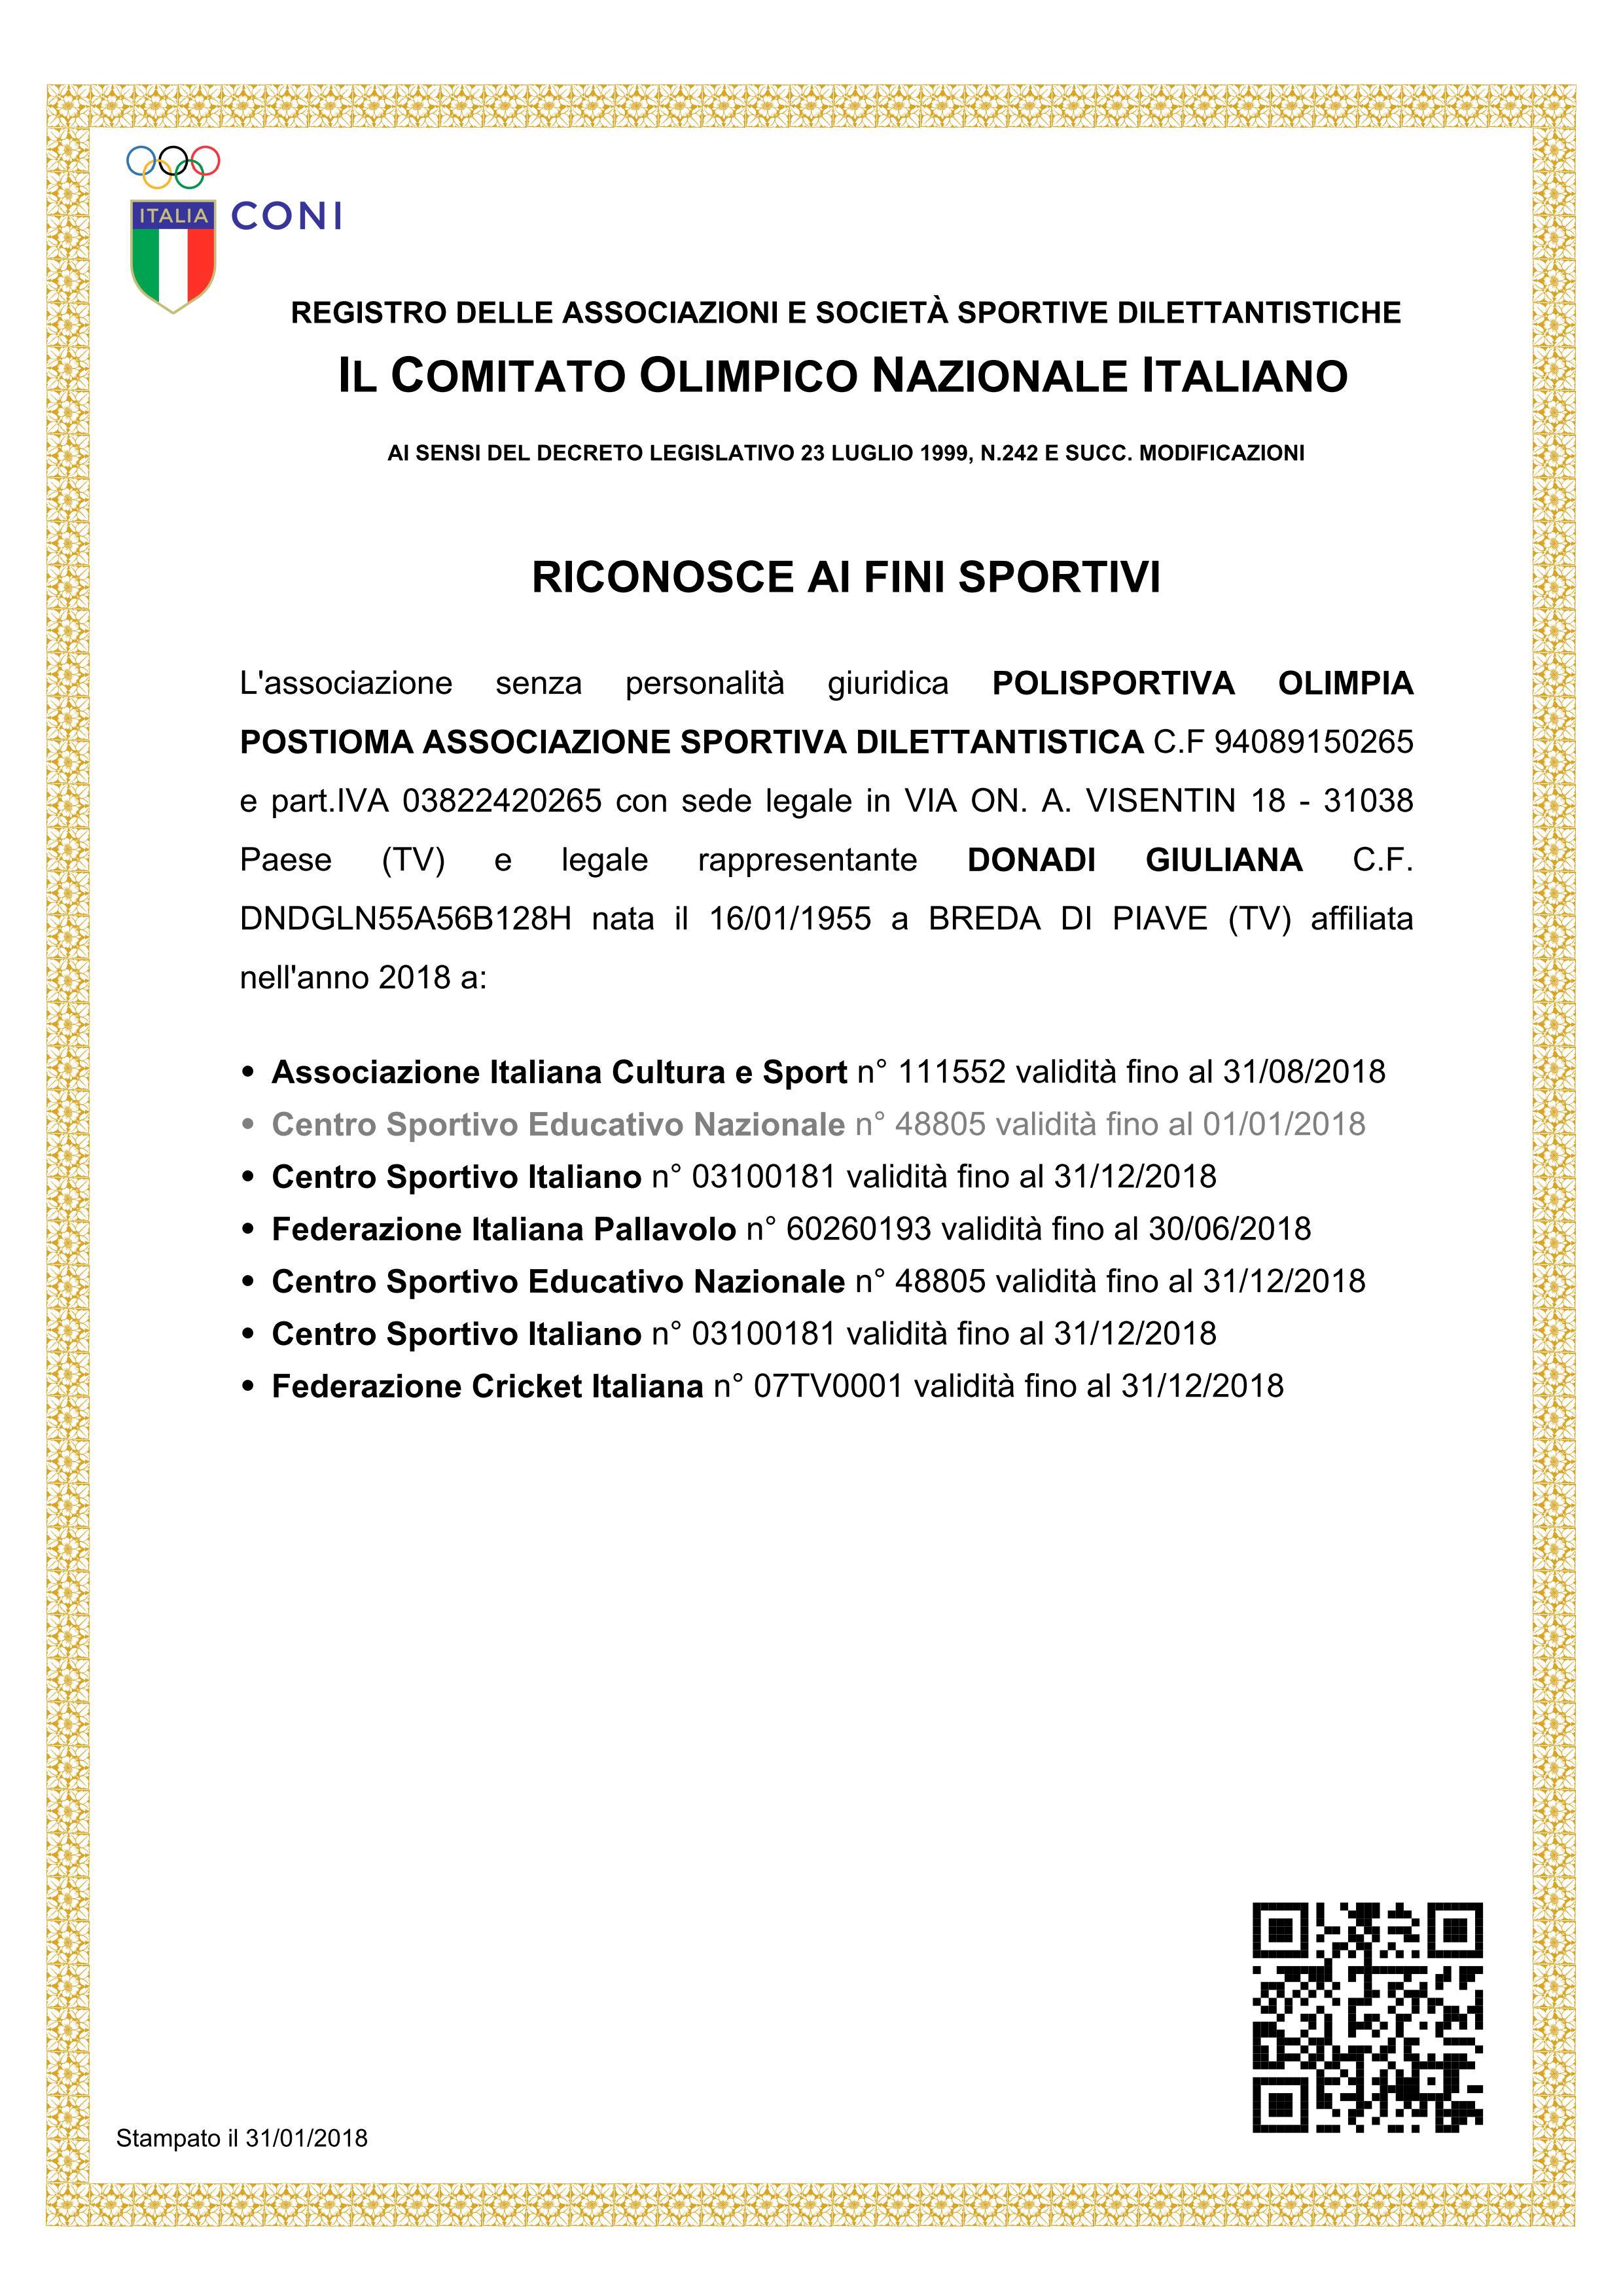 certificato affiliazioni